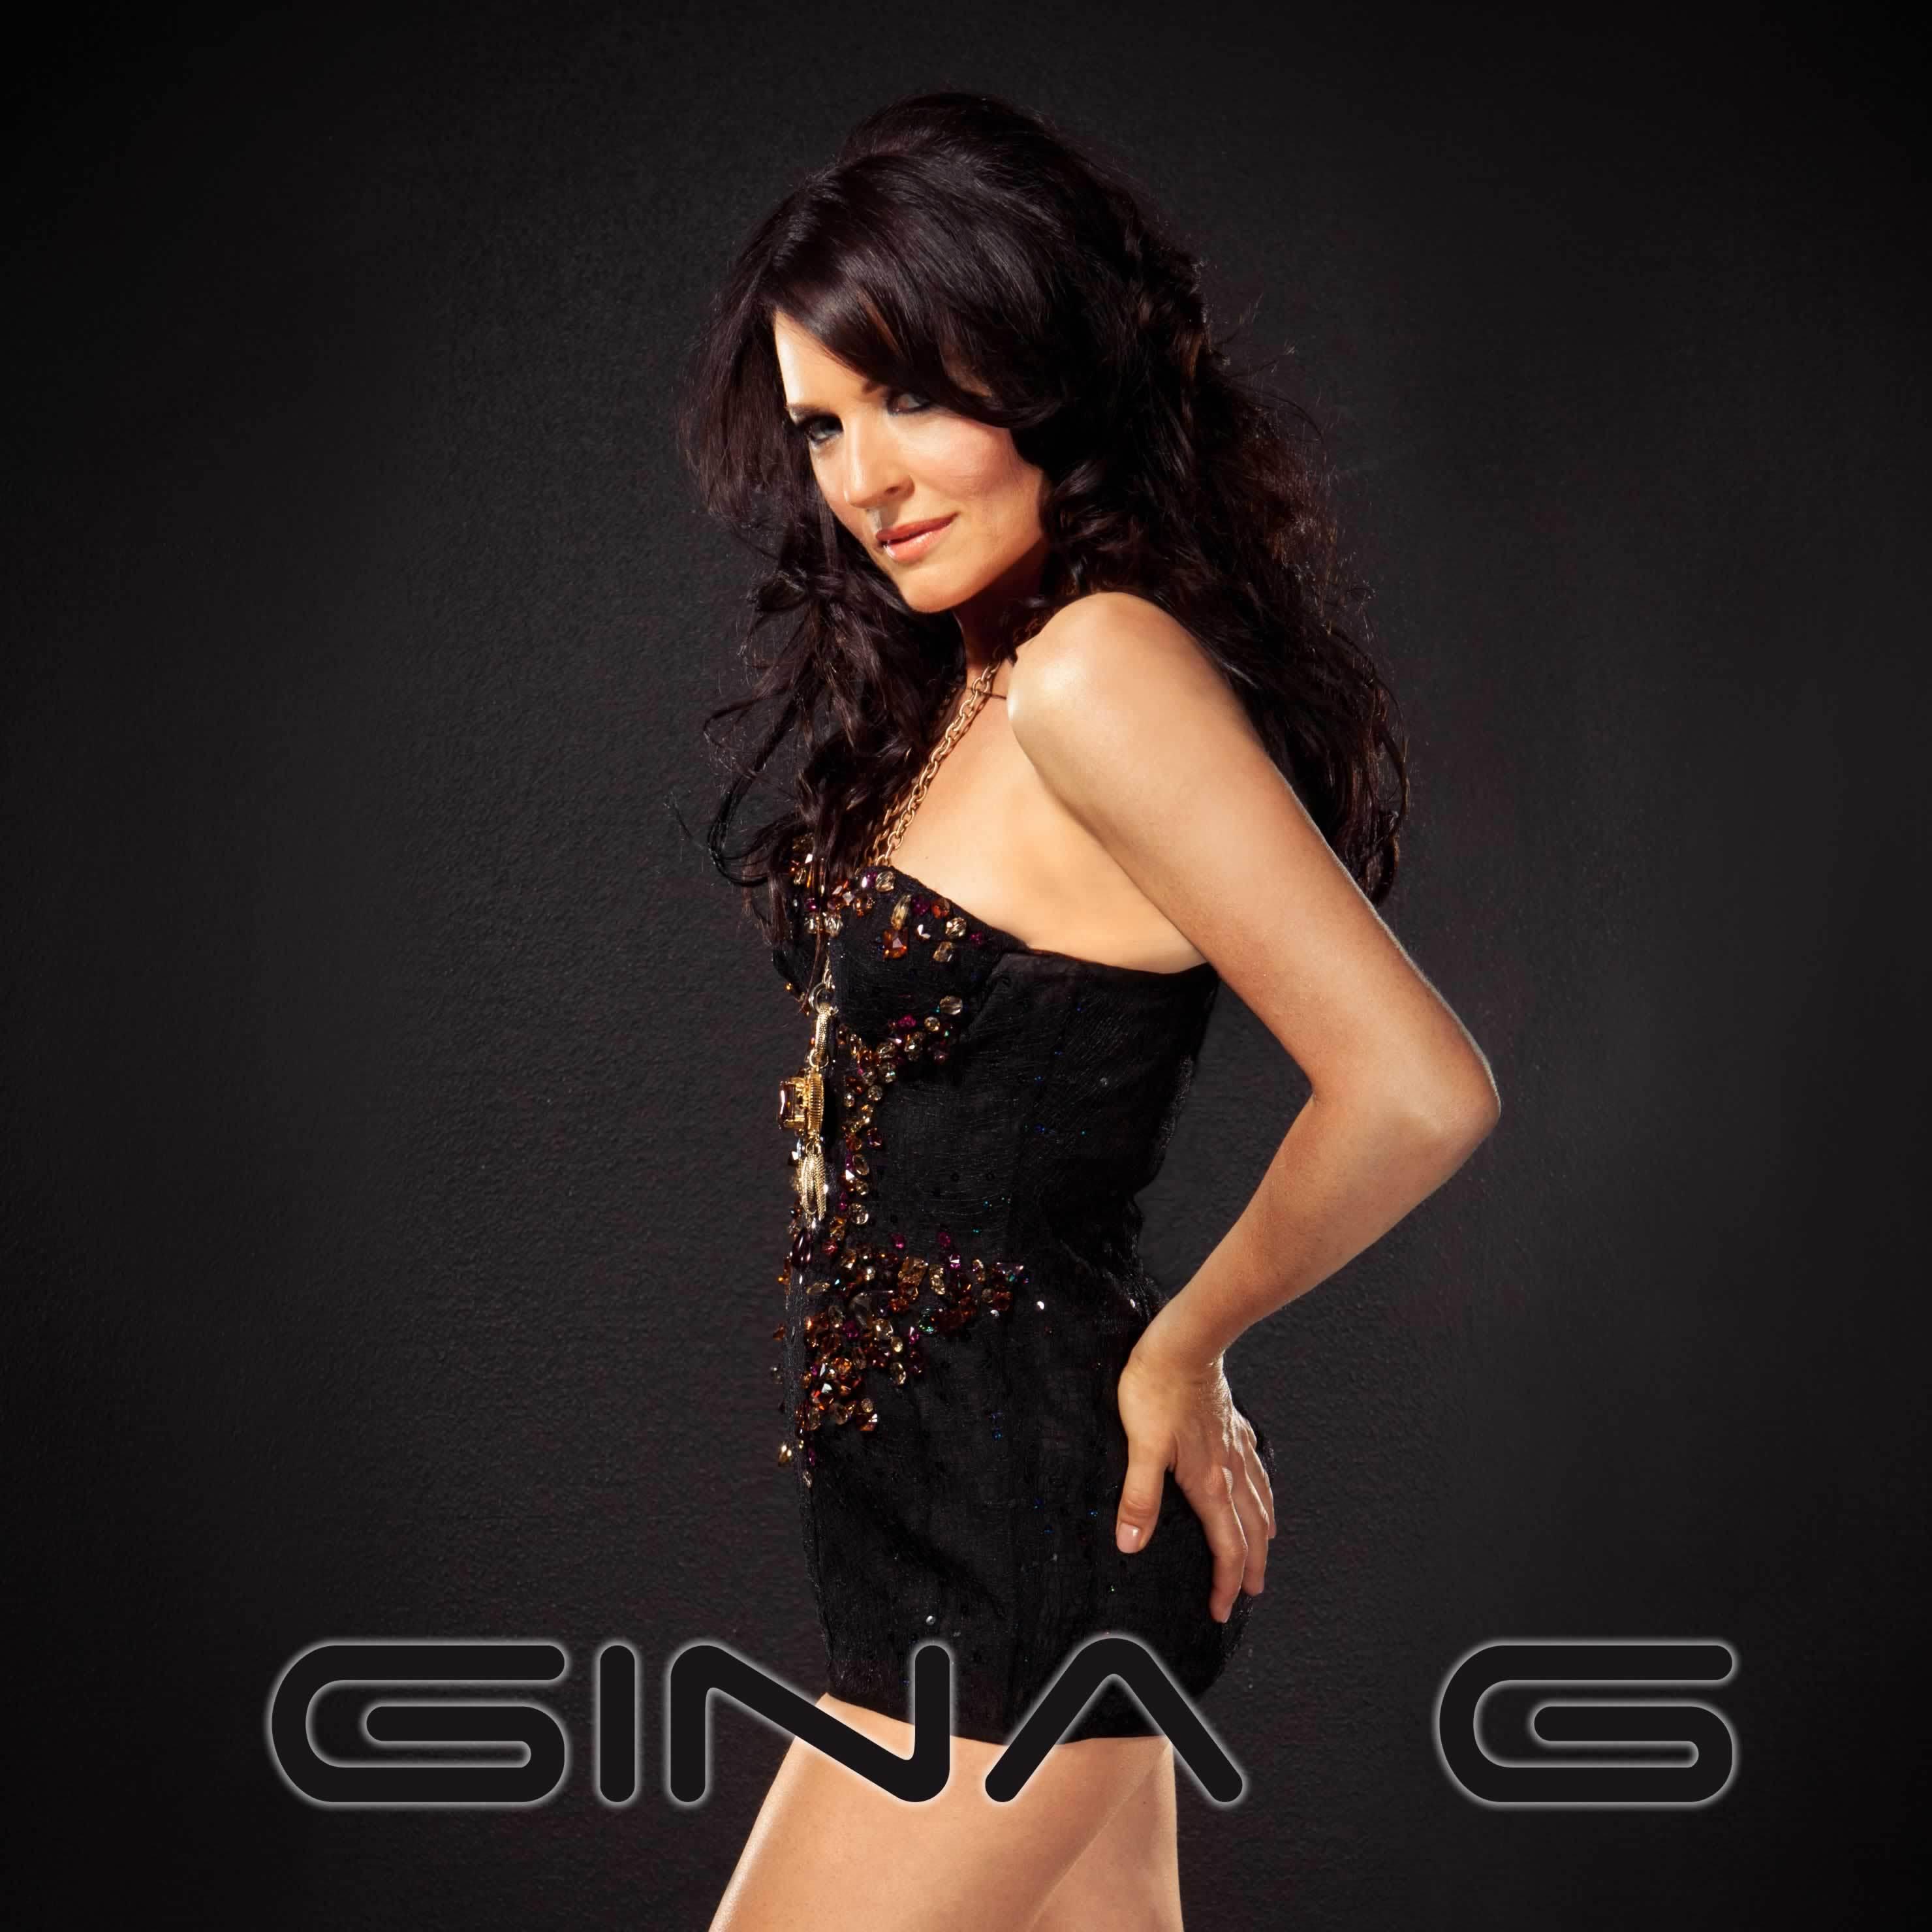 Gina G on Twitter